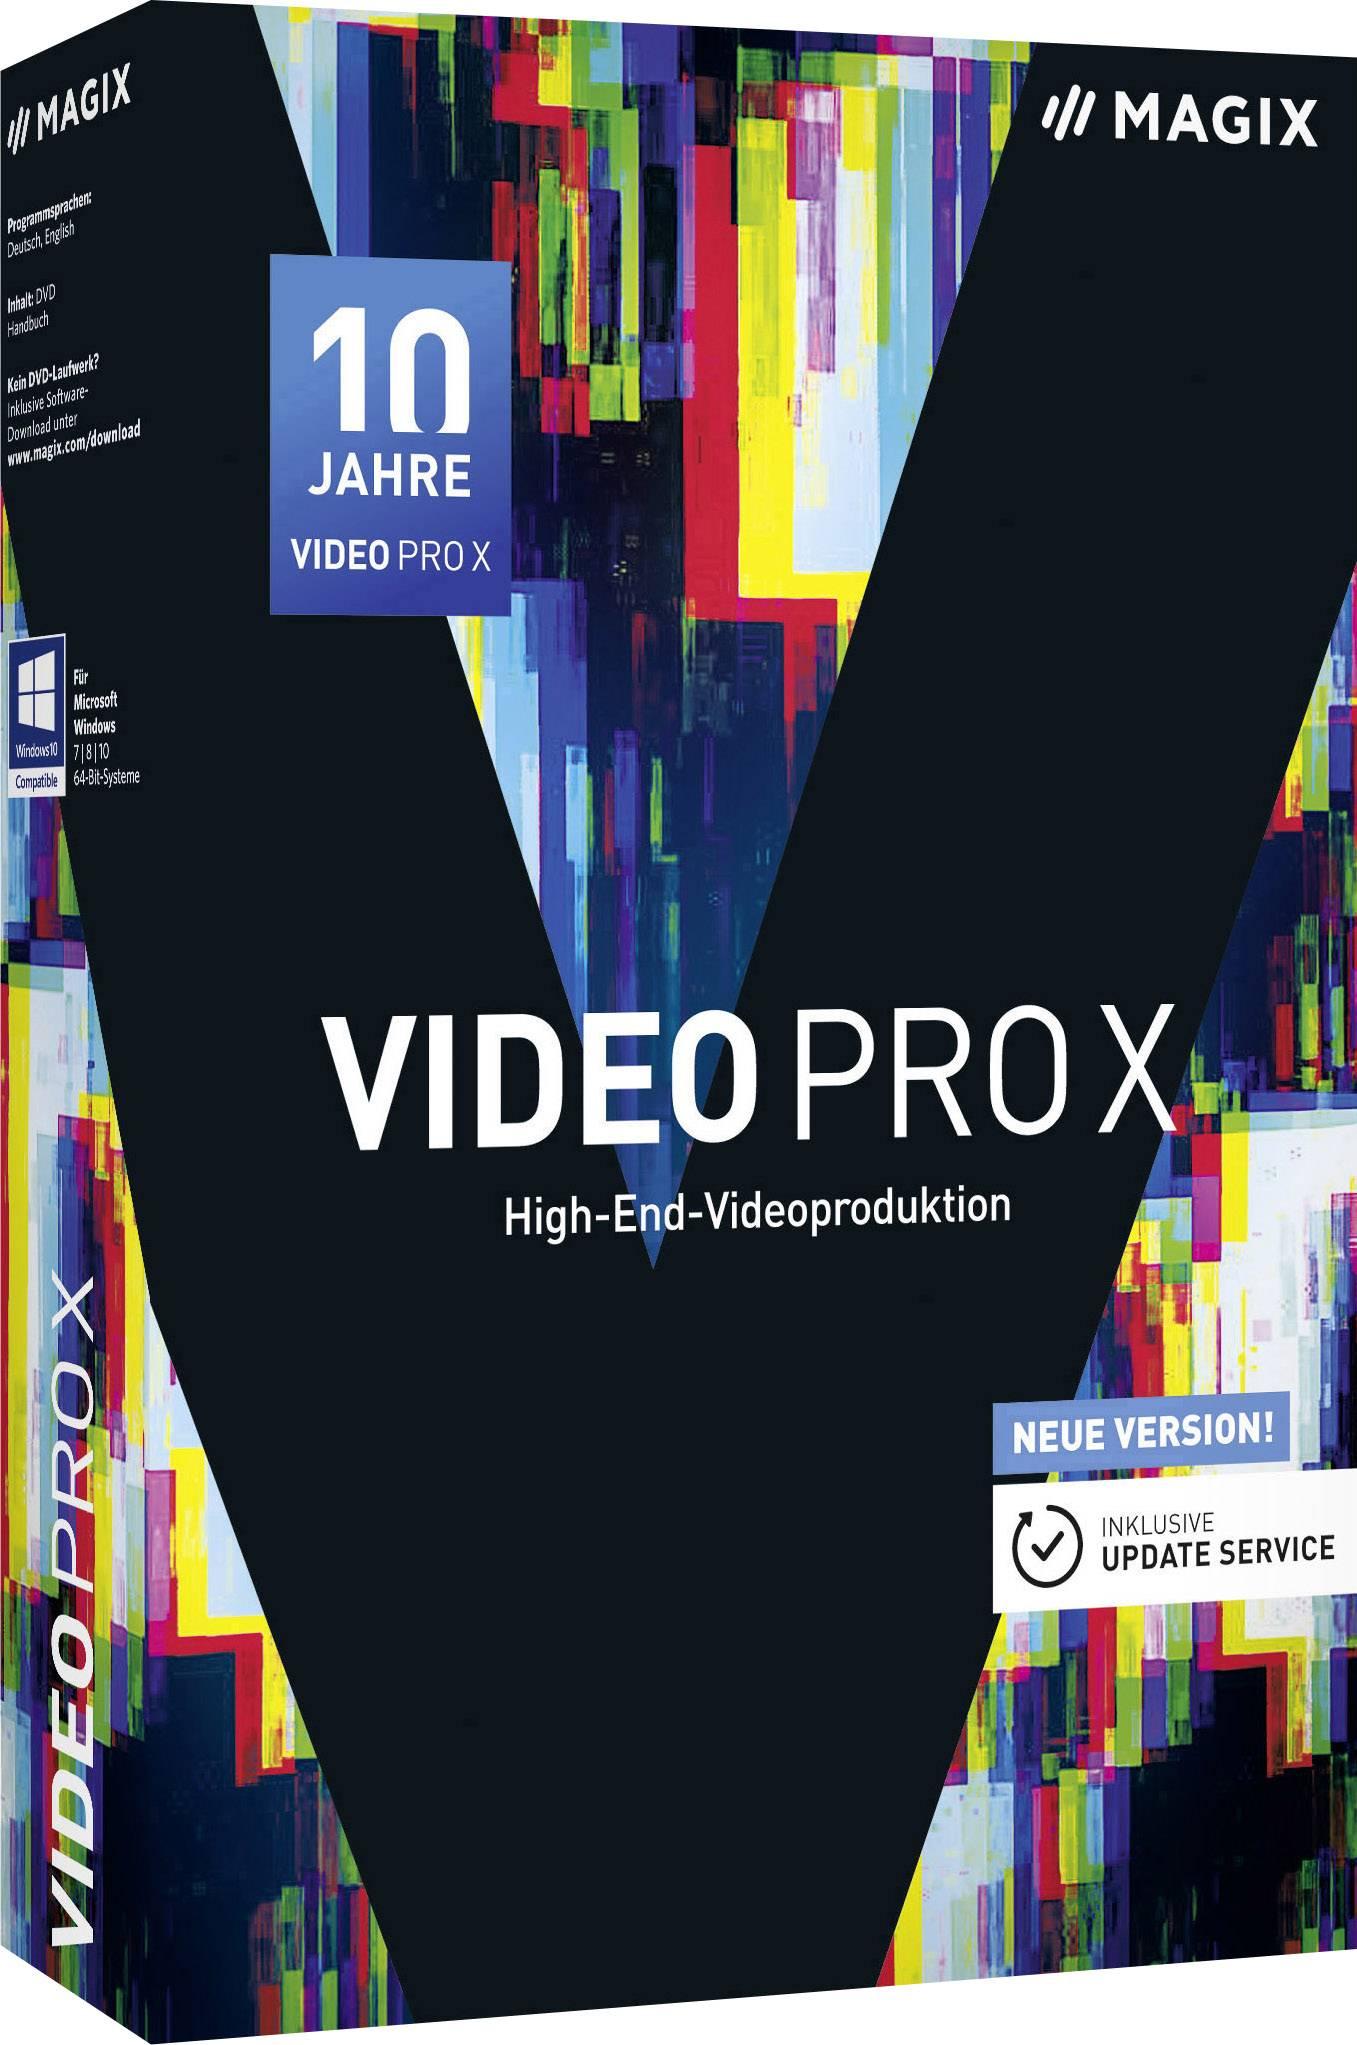 Magix Video Pro X Full version, 1 license Windows Video editor